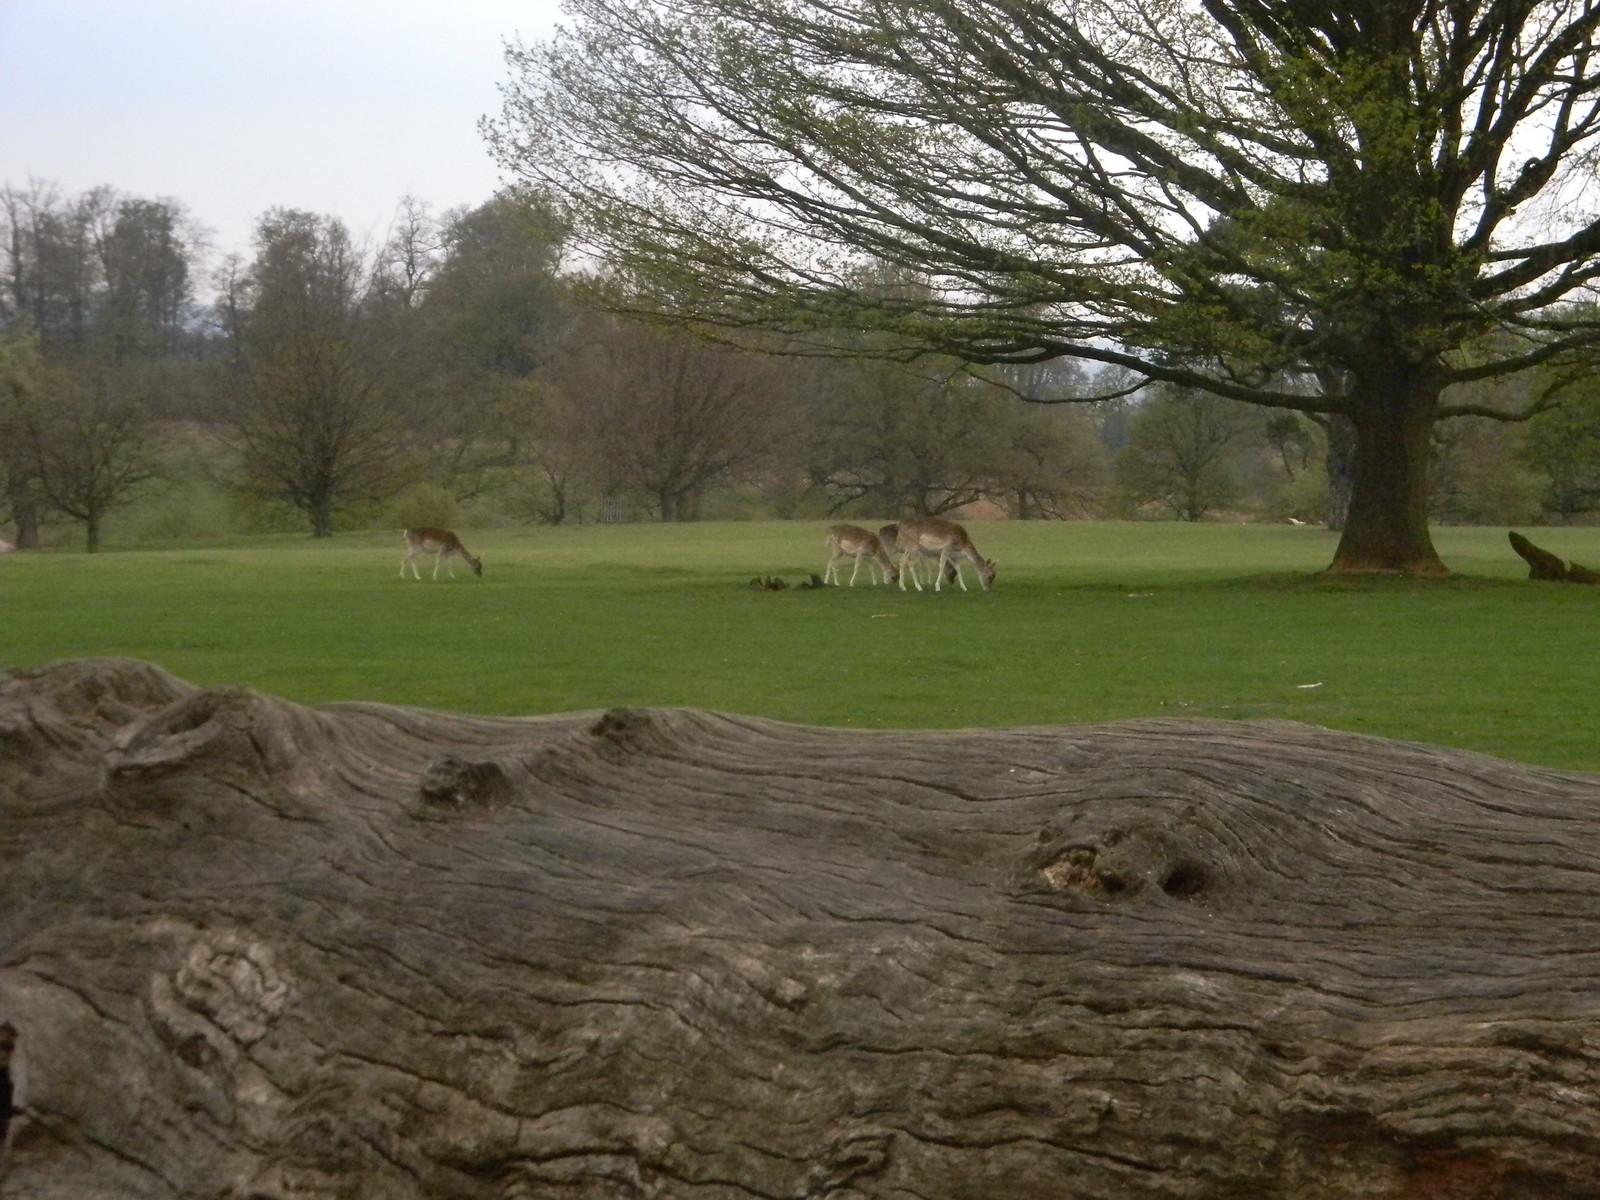 Knole Park deer Yalding to Sevenoaks